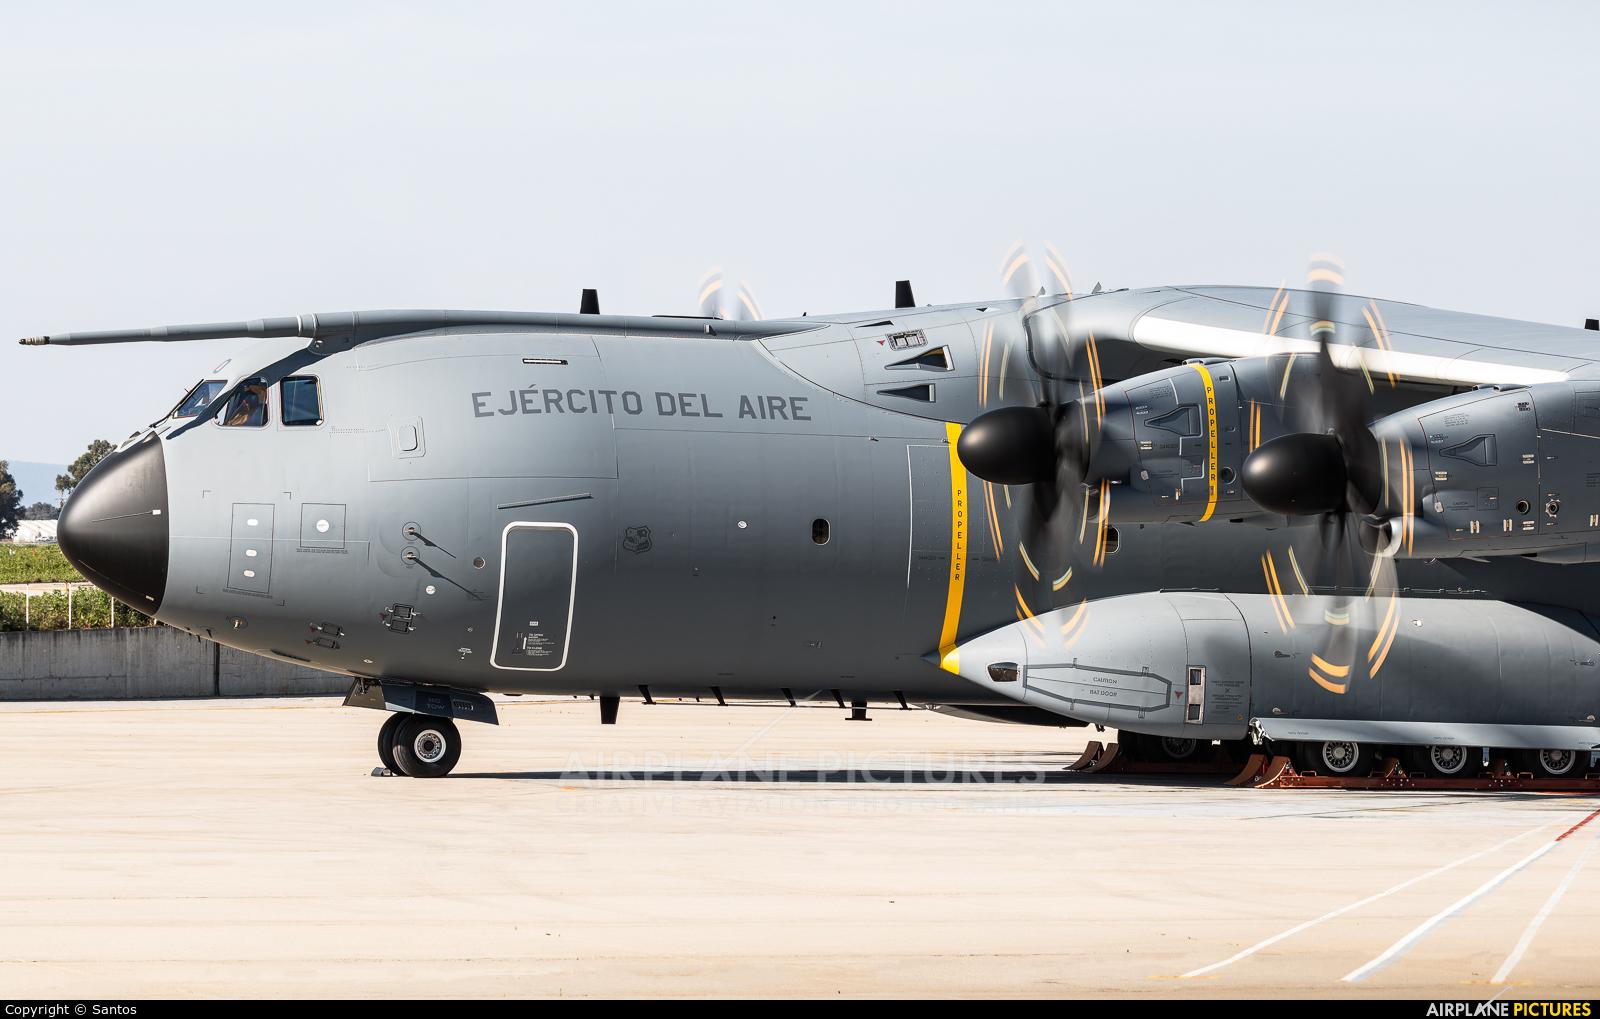 Spain - Air Force T.23-10 aircraft at Seville - San Pablo